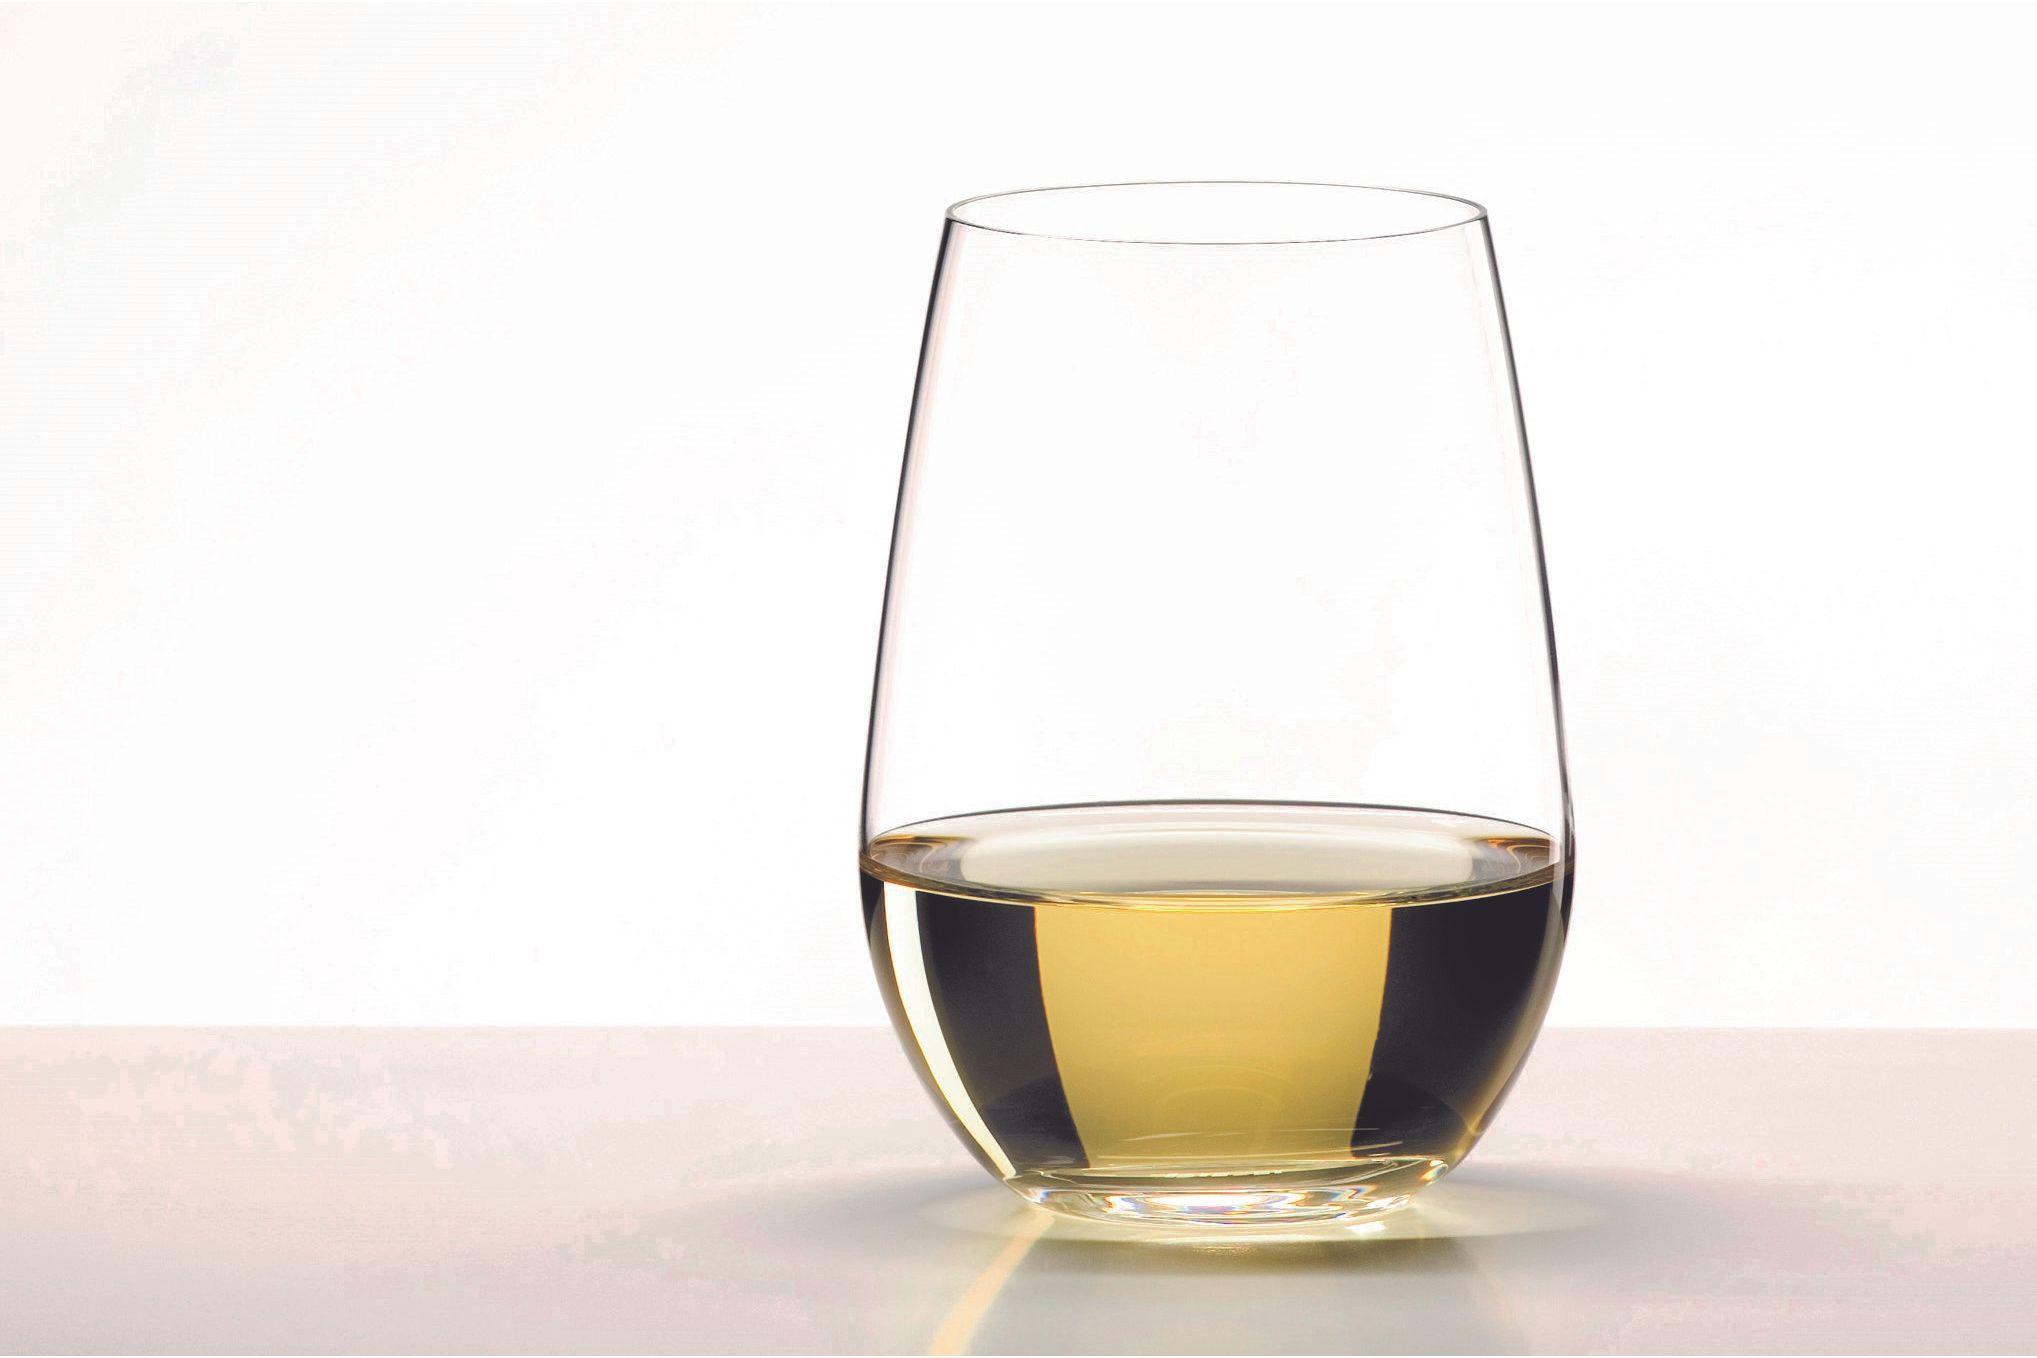 Riedel Riedel O Pair of White Wine Glasses Riesling/Sauvignon Blanc 375ml thumb 2